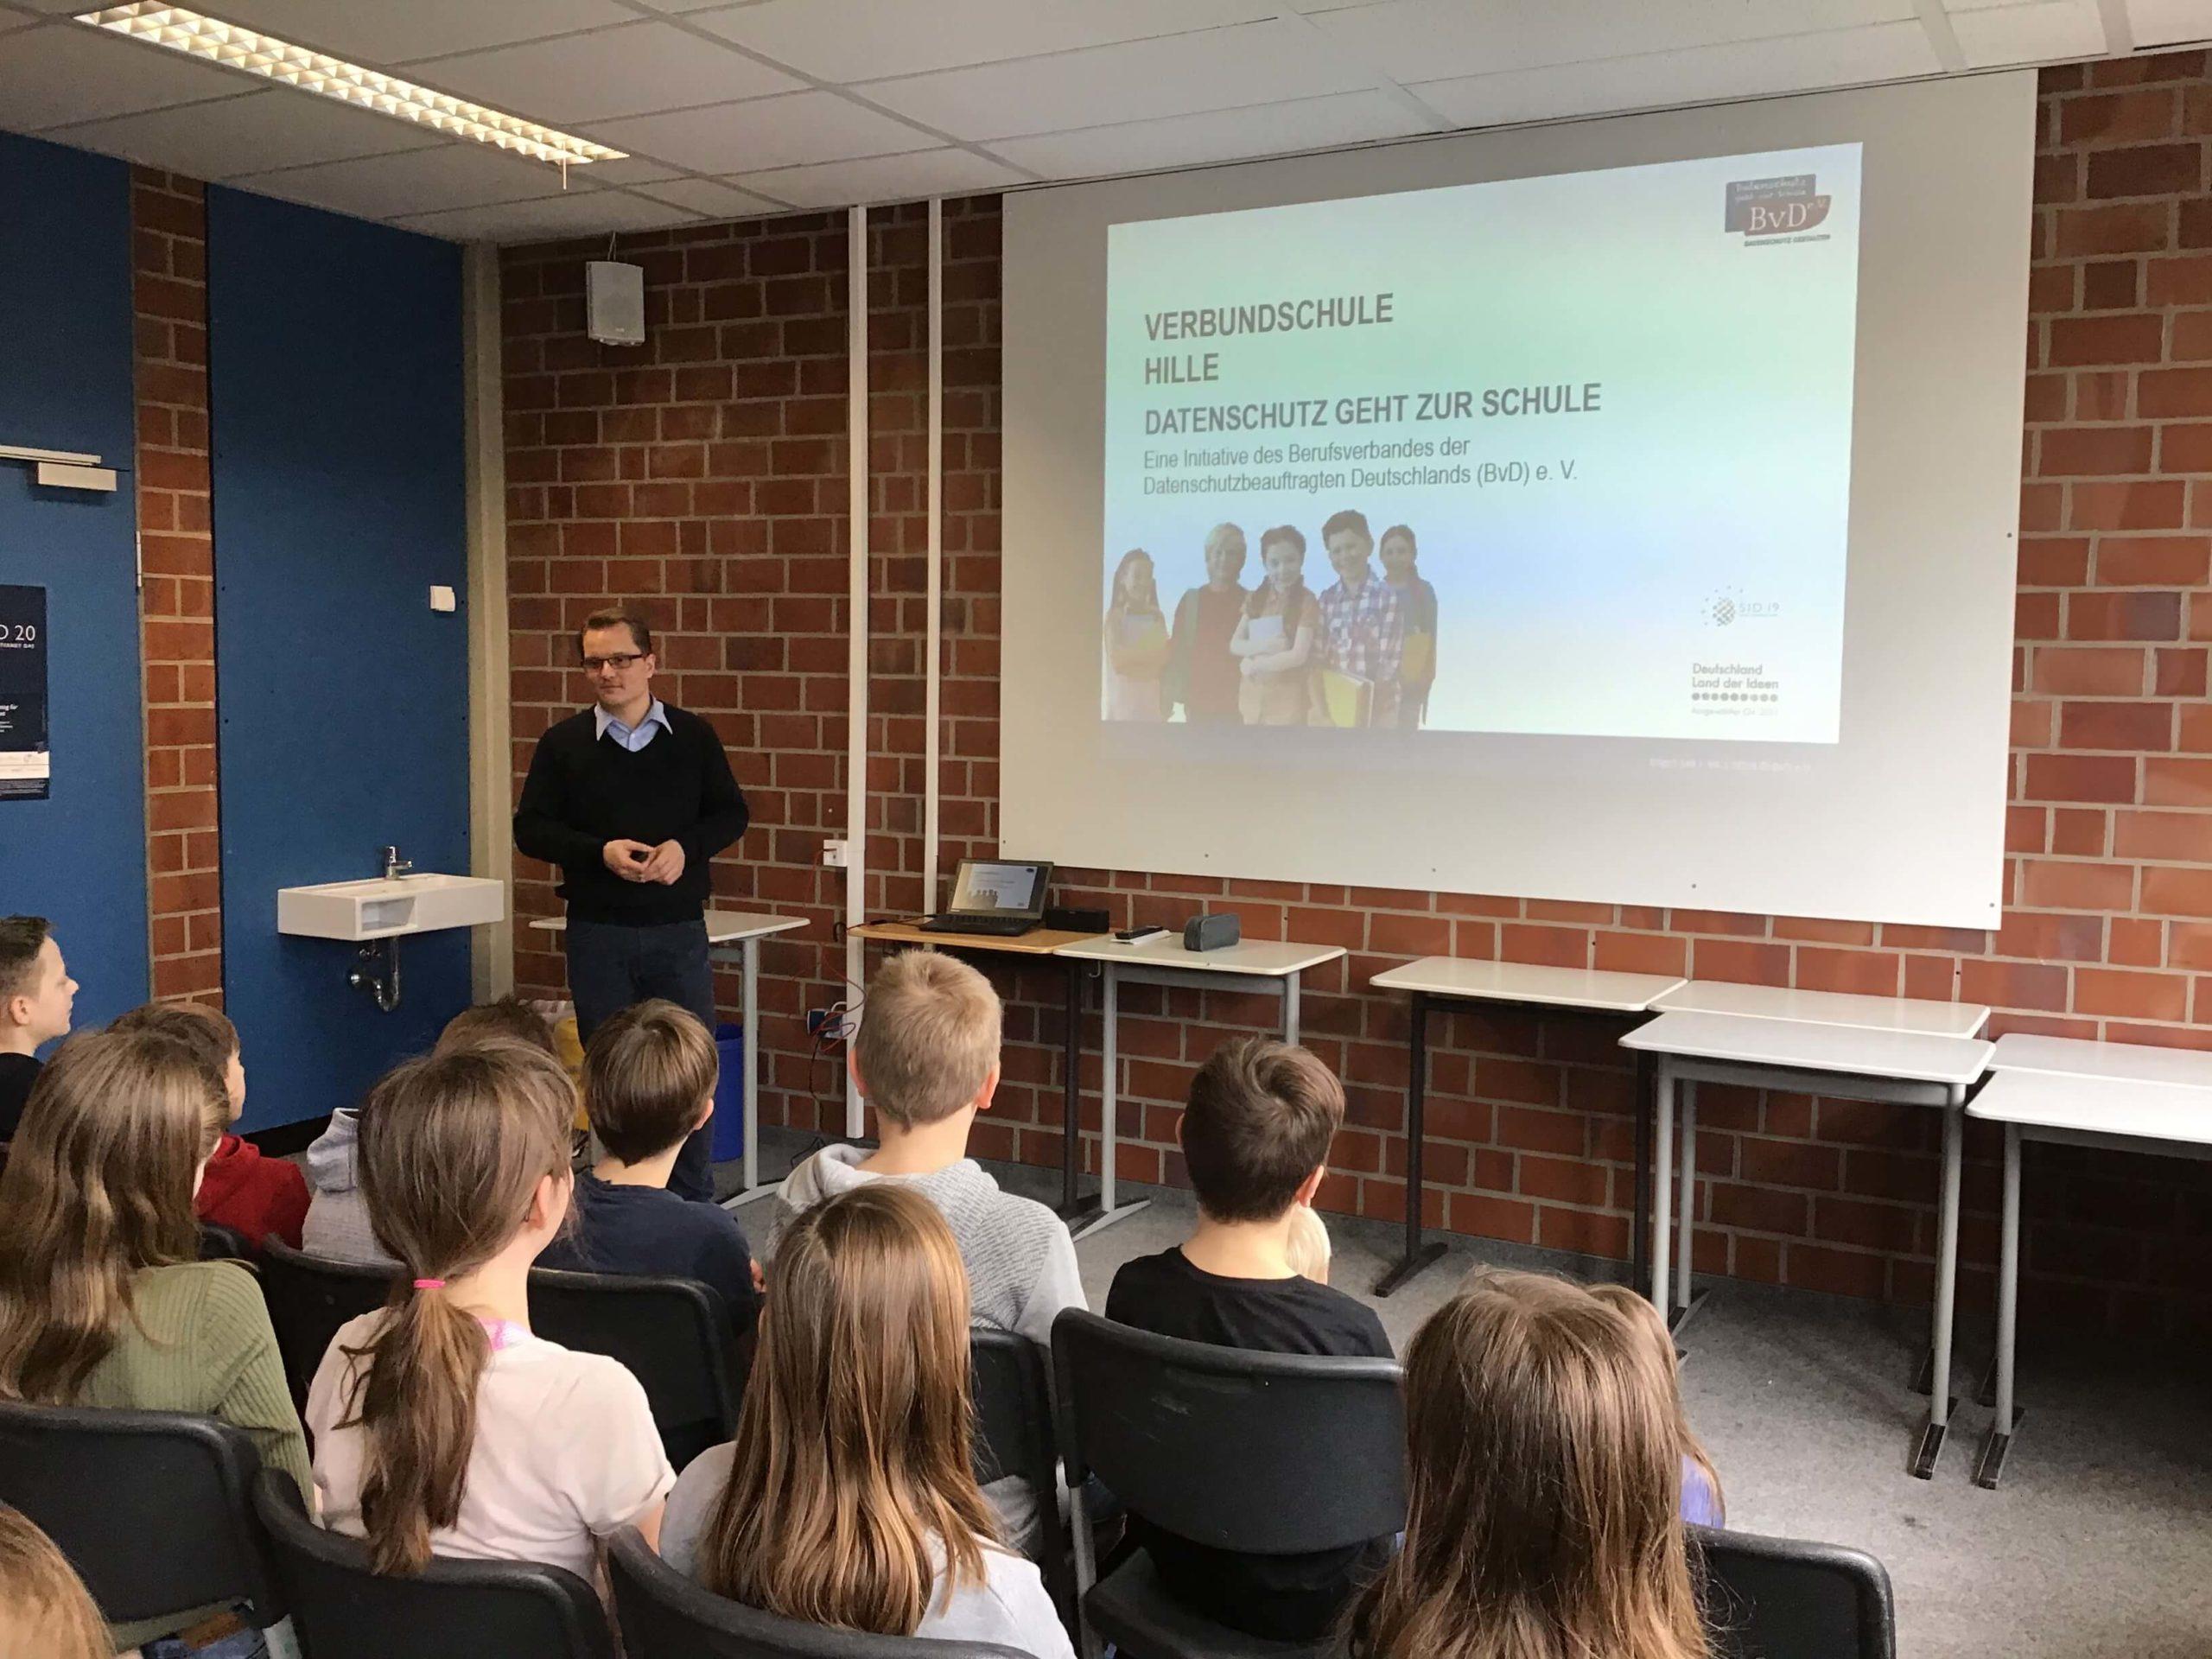 http://www.verbundschule-hille.de/workshop-datenschutz-geht-zur-schule/